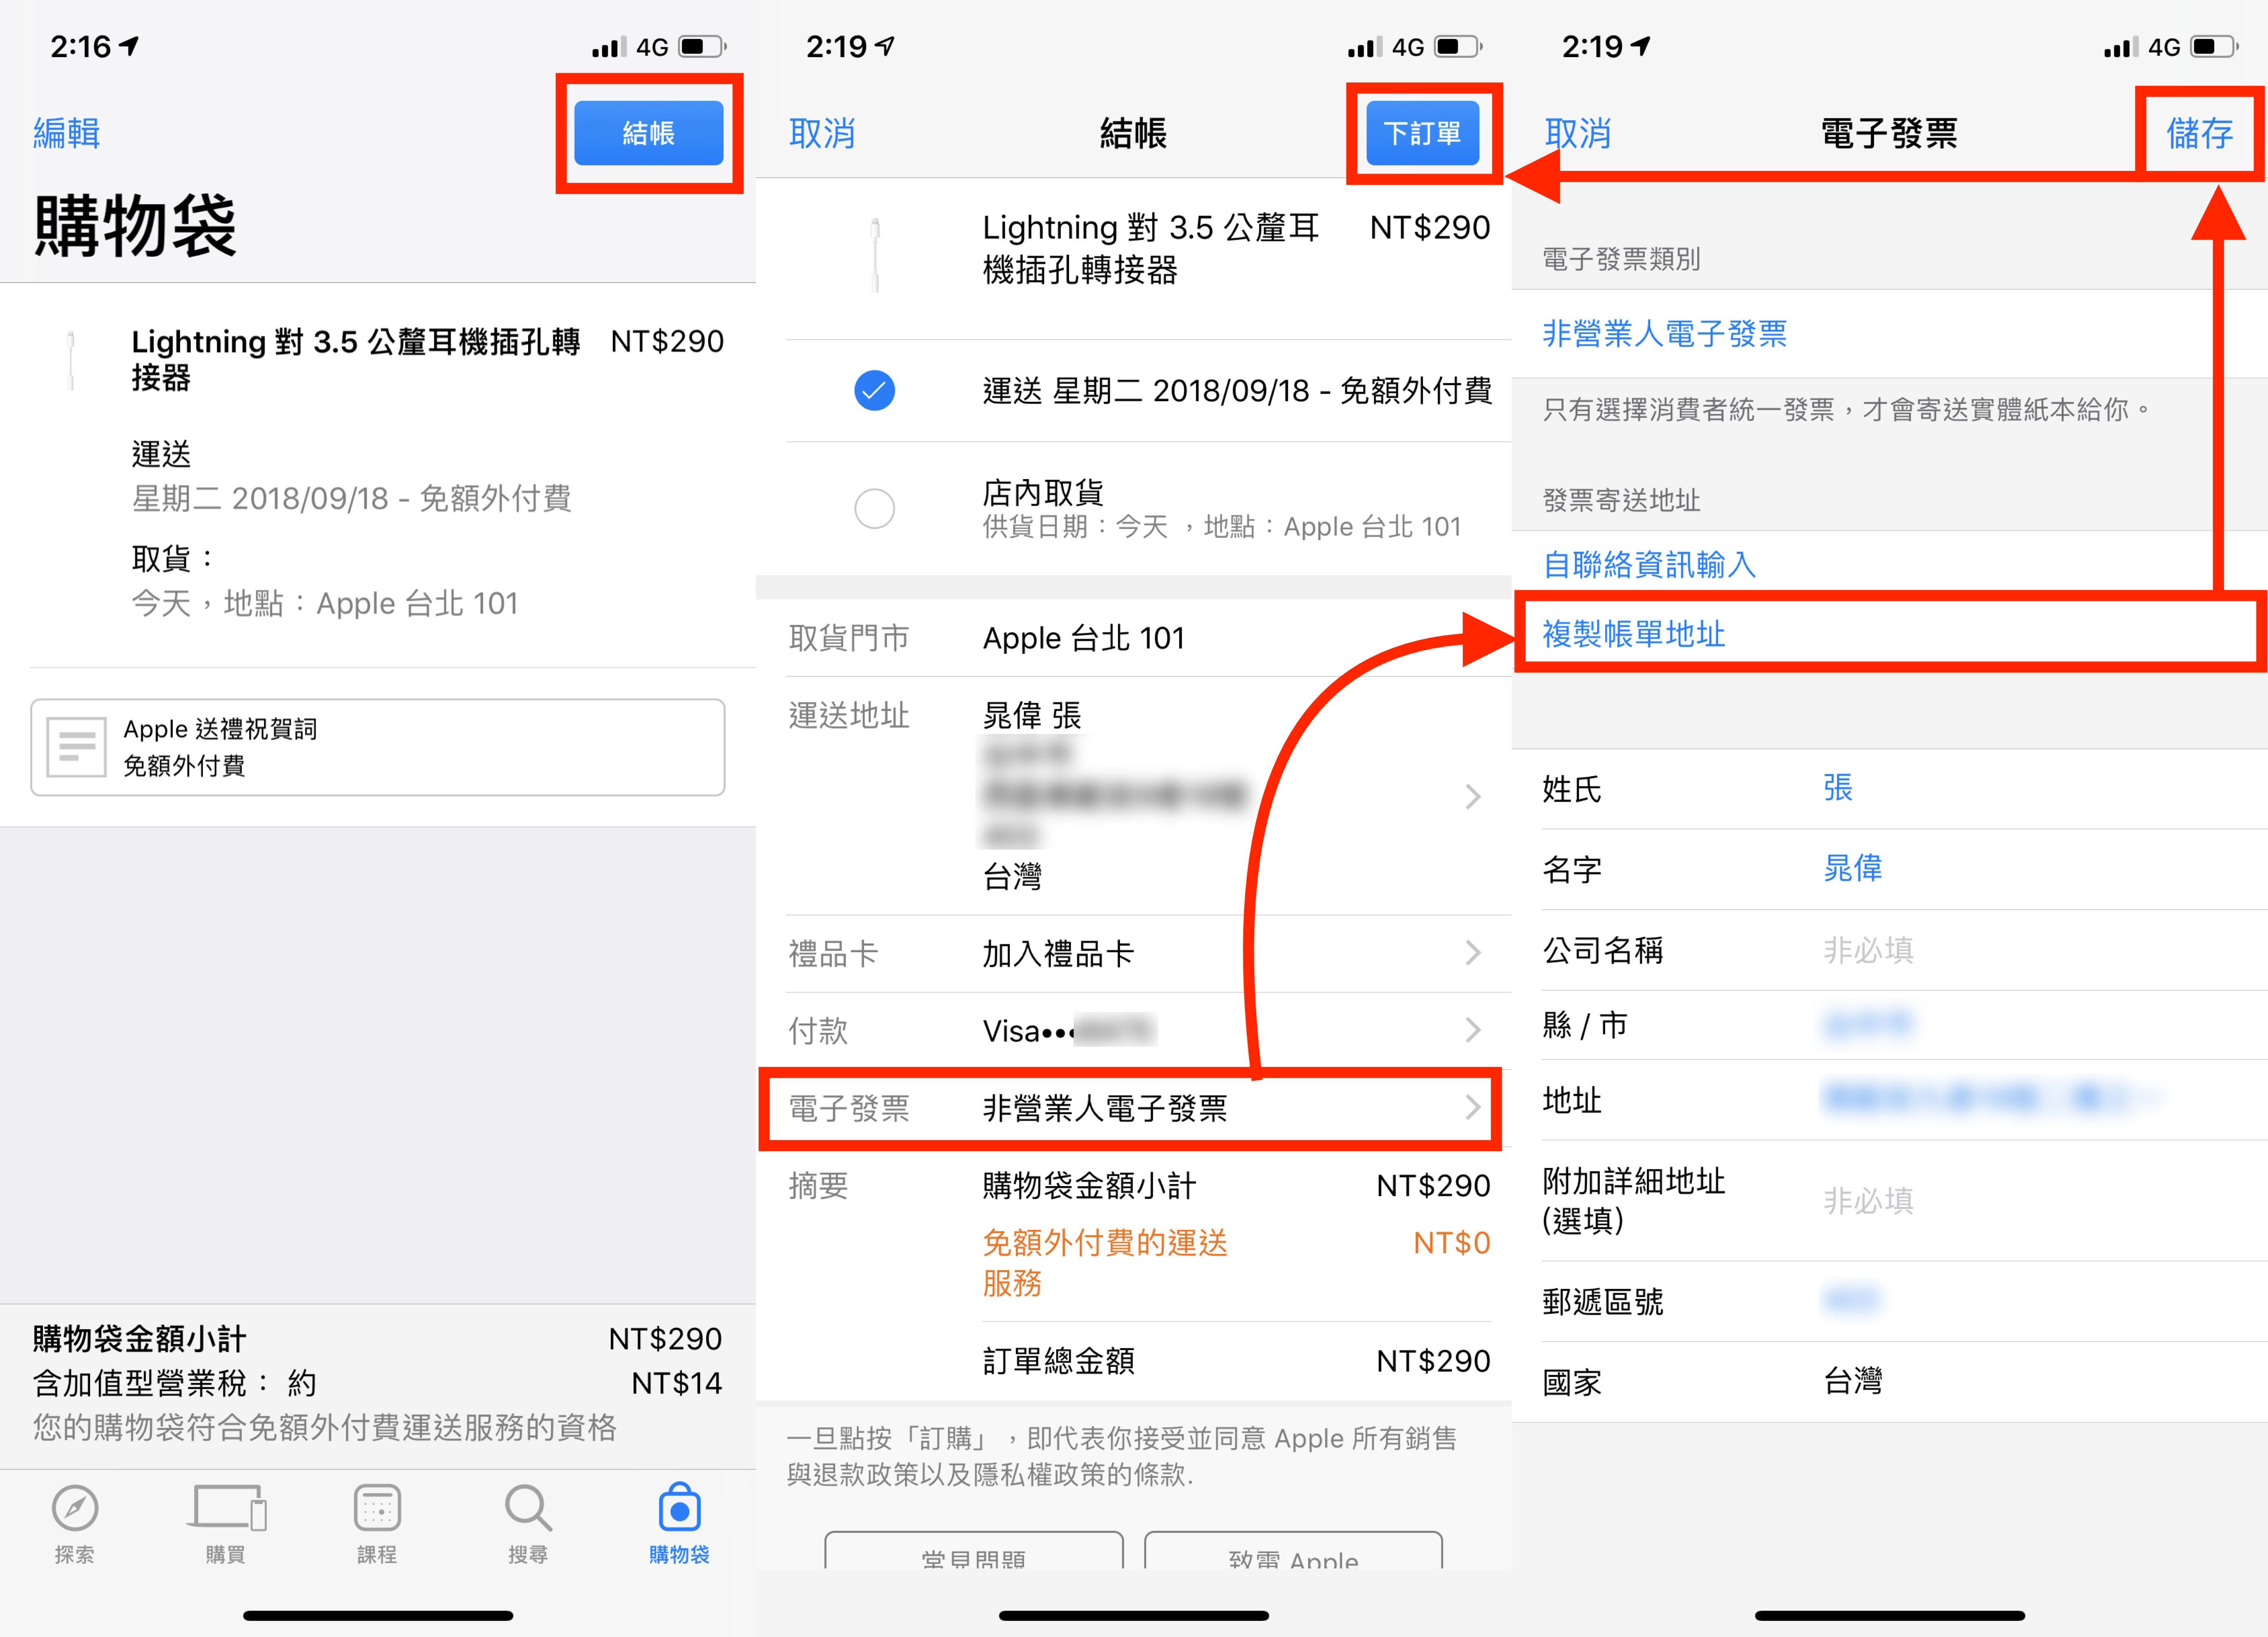 iPhone XS、iPhone XS Max、iPhone 預購